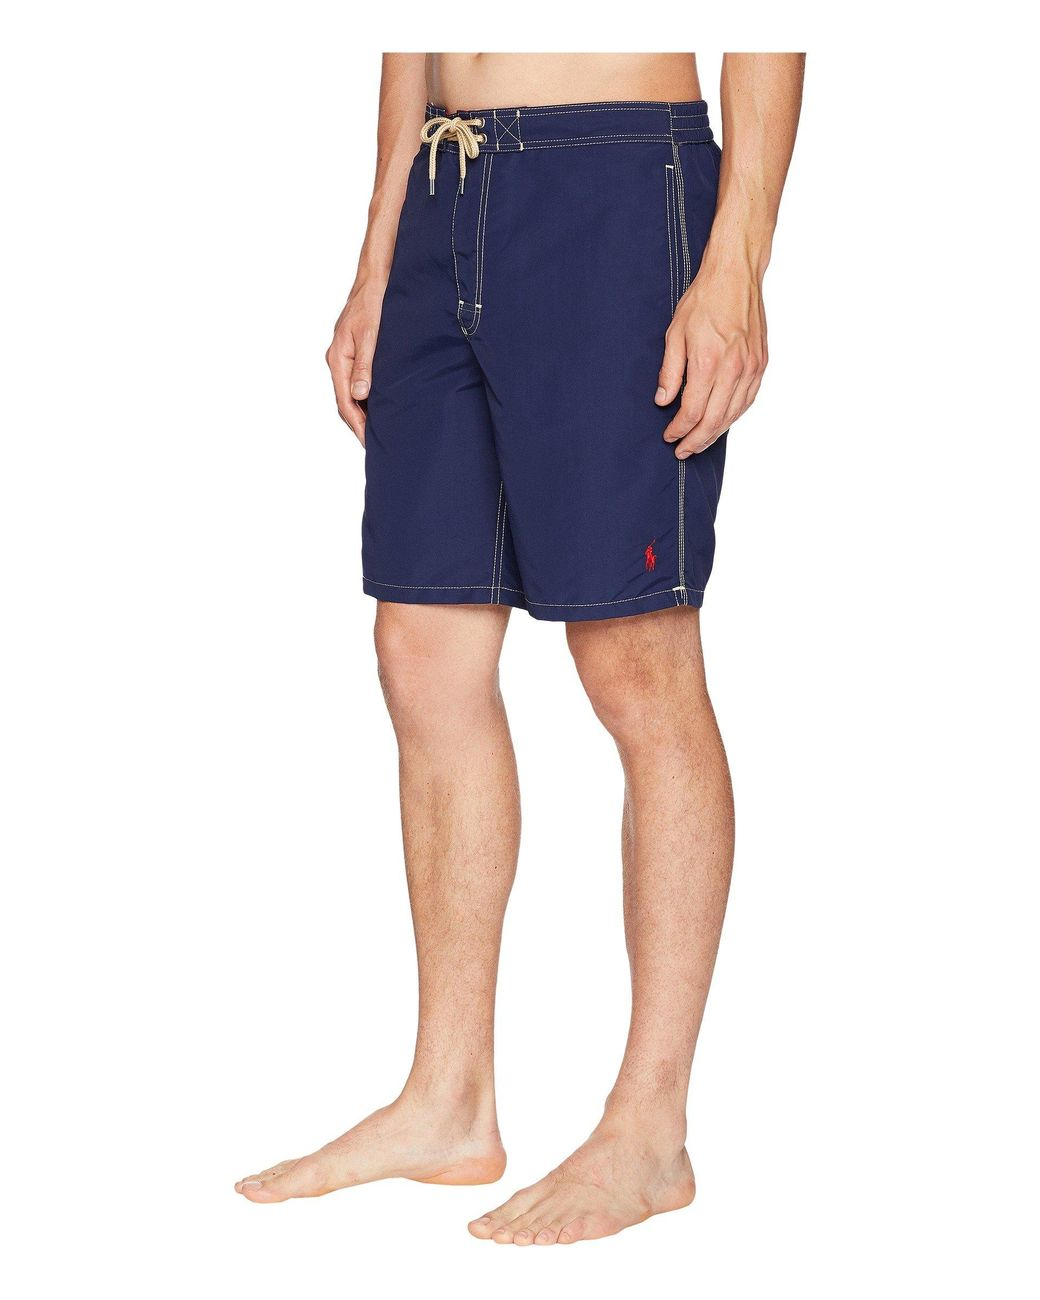 Men/'s Polo Ralph Lauren CORE KAILUA Newport Navy Blue Swim Trunks Beach Shorts S